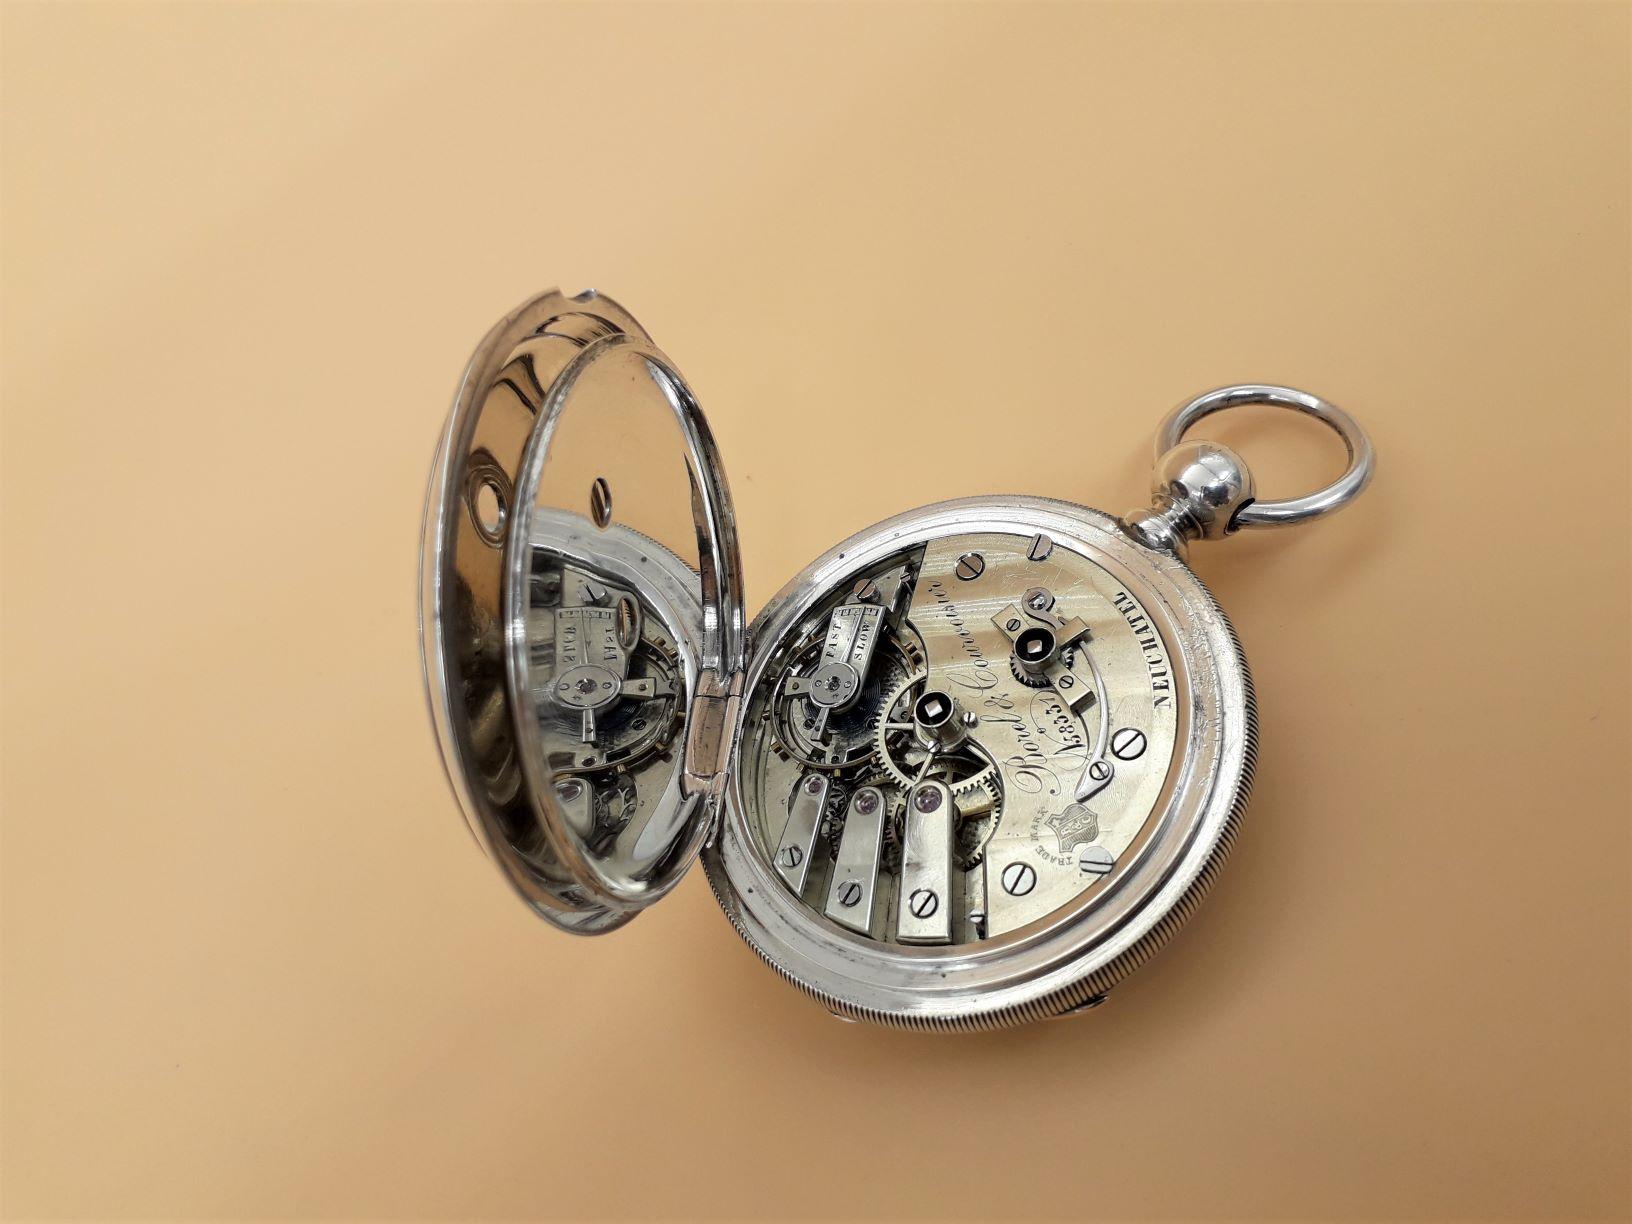 Swiss pocket watch by Borel & Courvoisier, Neuchatel